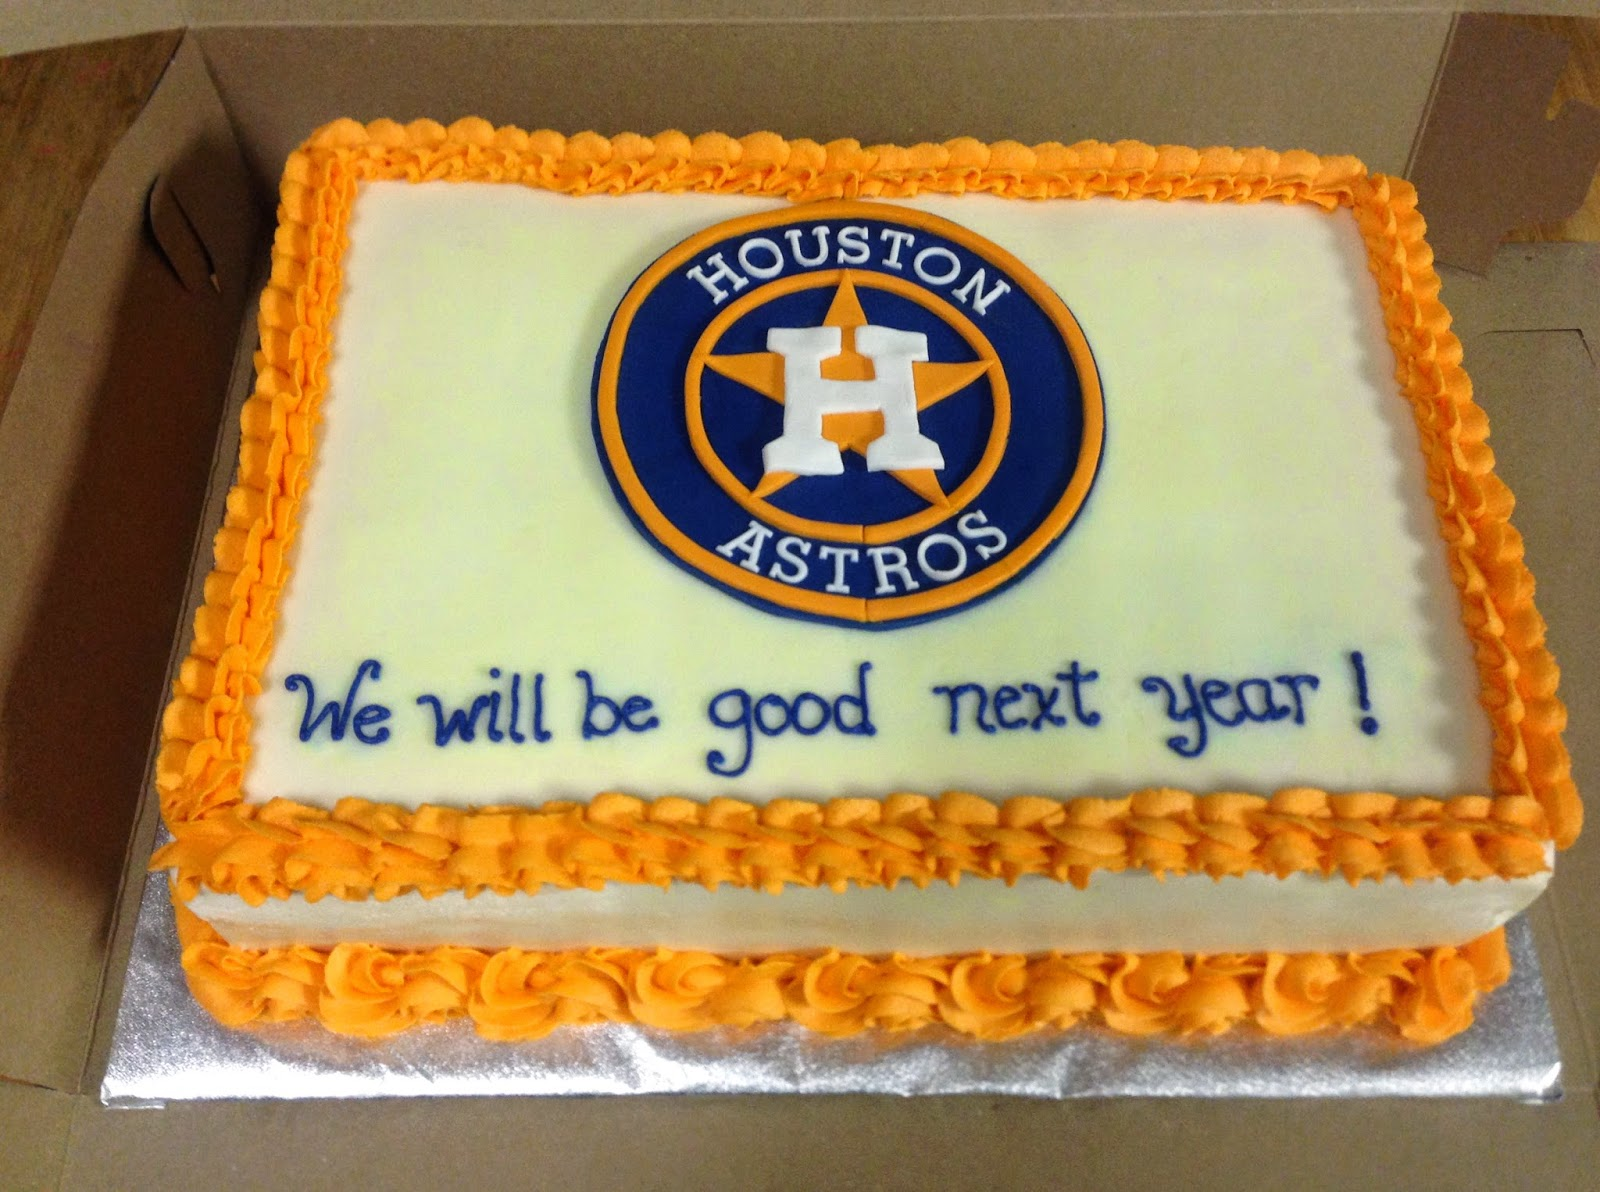 Best Birthday Cakes In Houston My blog